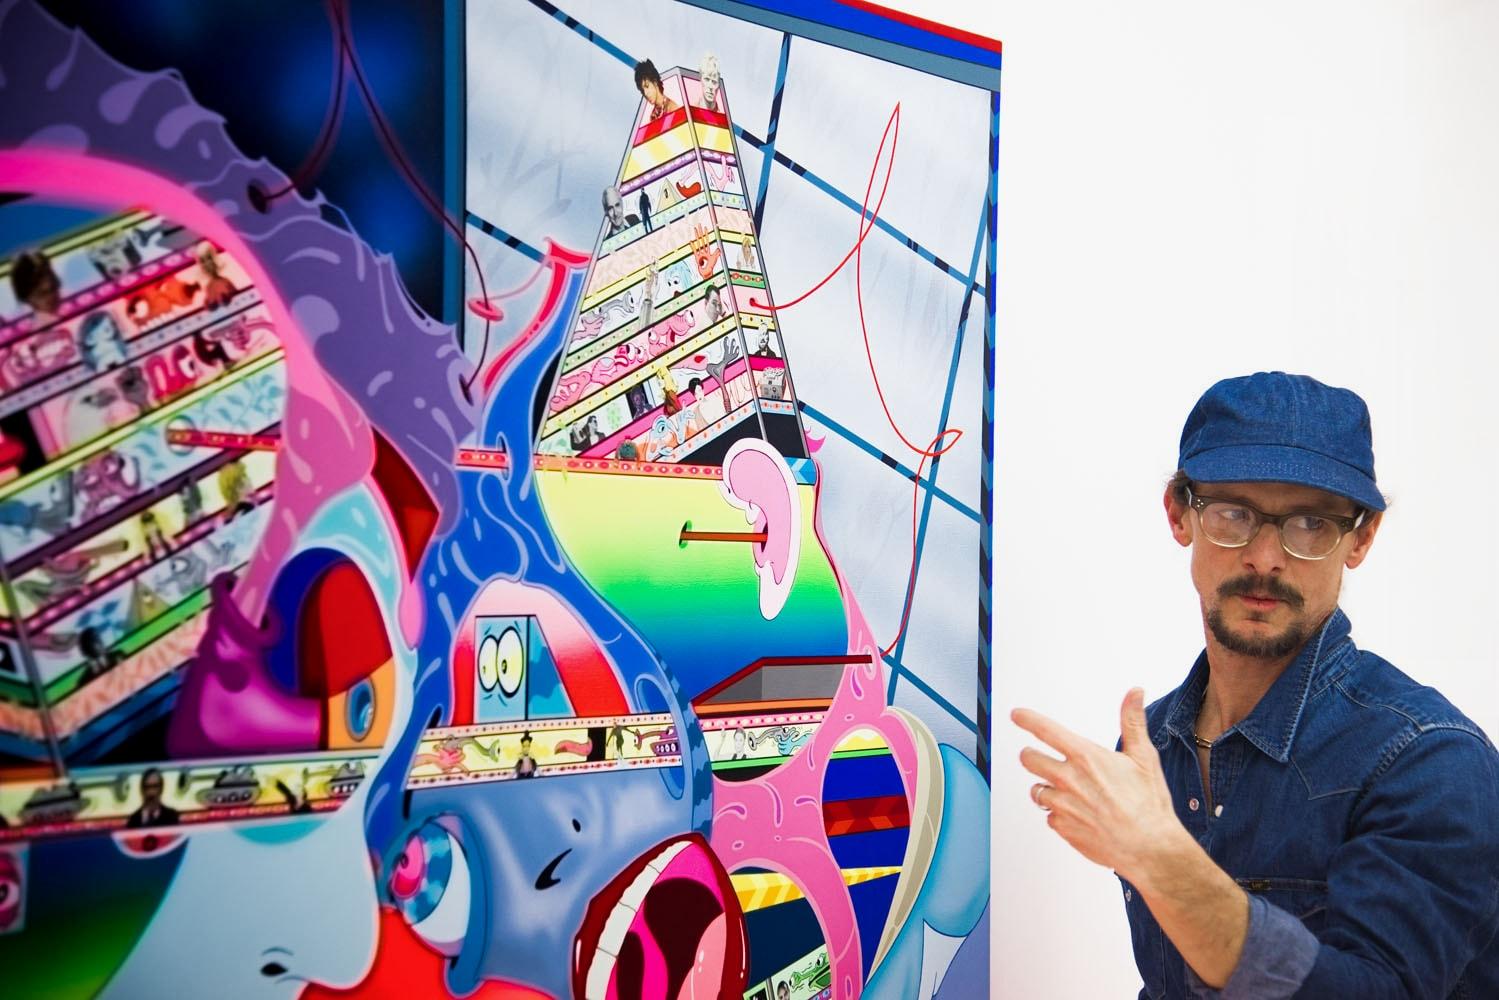 Erik Parker on KAWS & His Artwork 2017 Interview Brian Donnelly Run With the Hunted Hong Kong Art Basel 2017 AISHONANZUKA Air Jordan 4